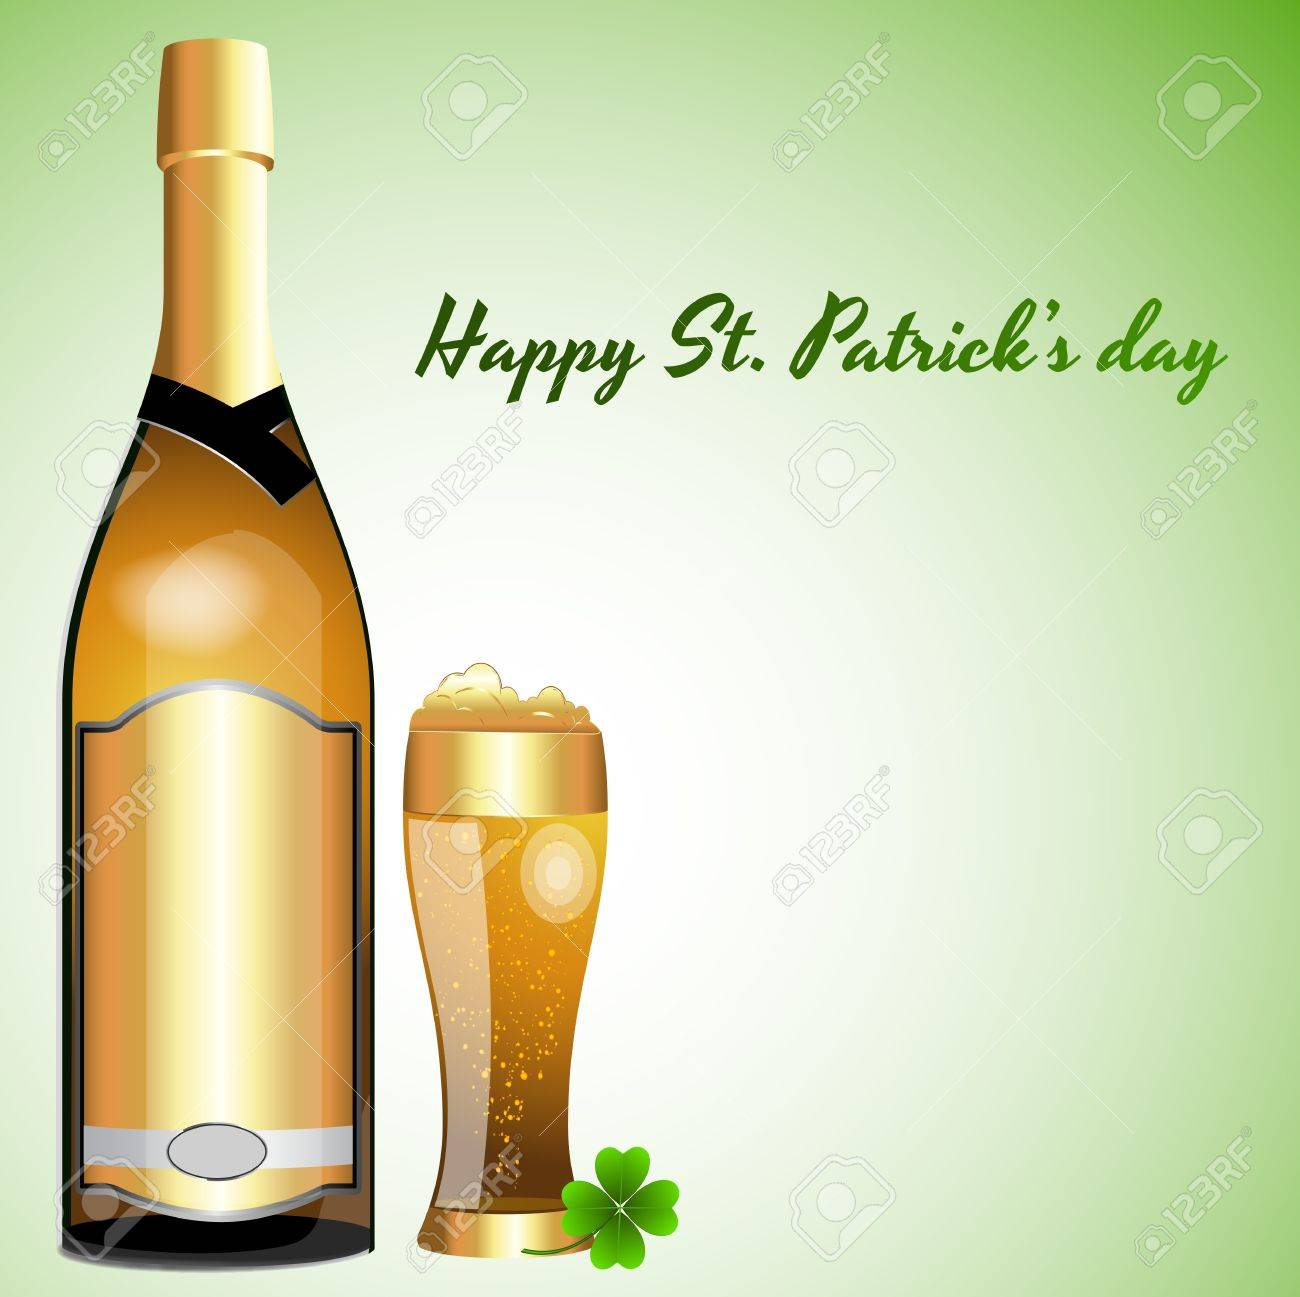 Beer Bottle with Glass of Beer Stock Vector - 12859073